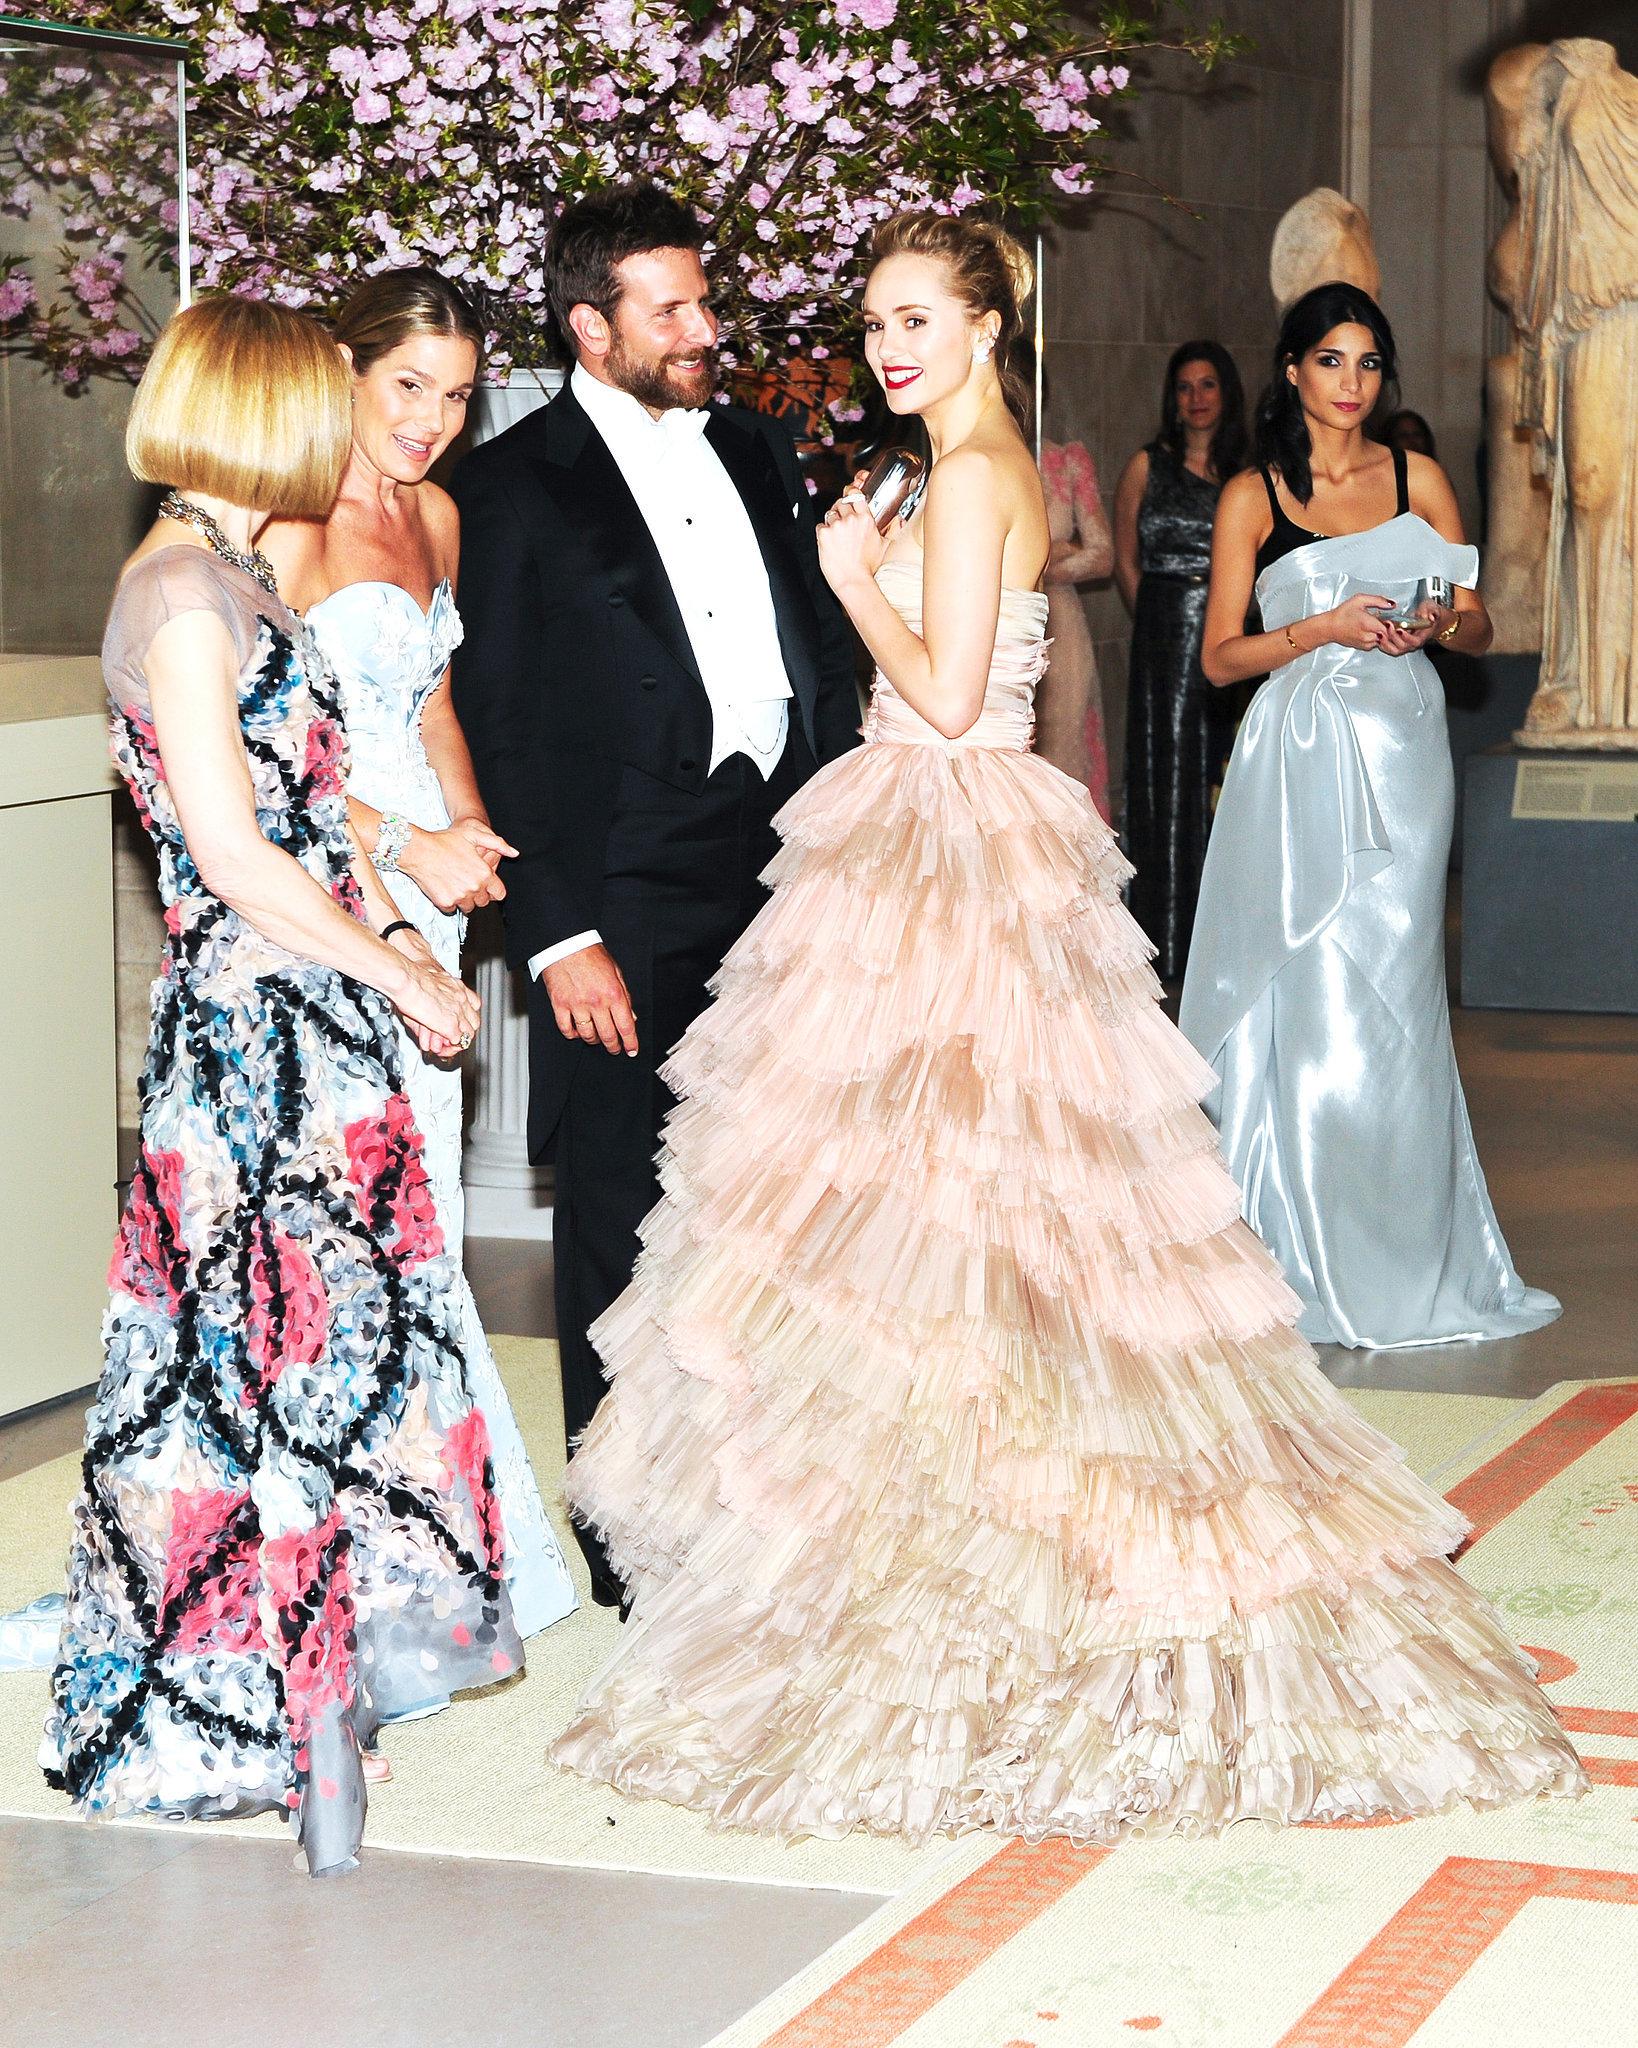 Bradley Cooper greeted girlfriend Suki Waterhouse in the receiving line.